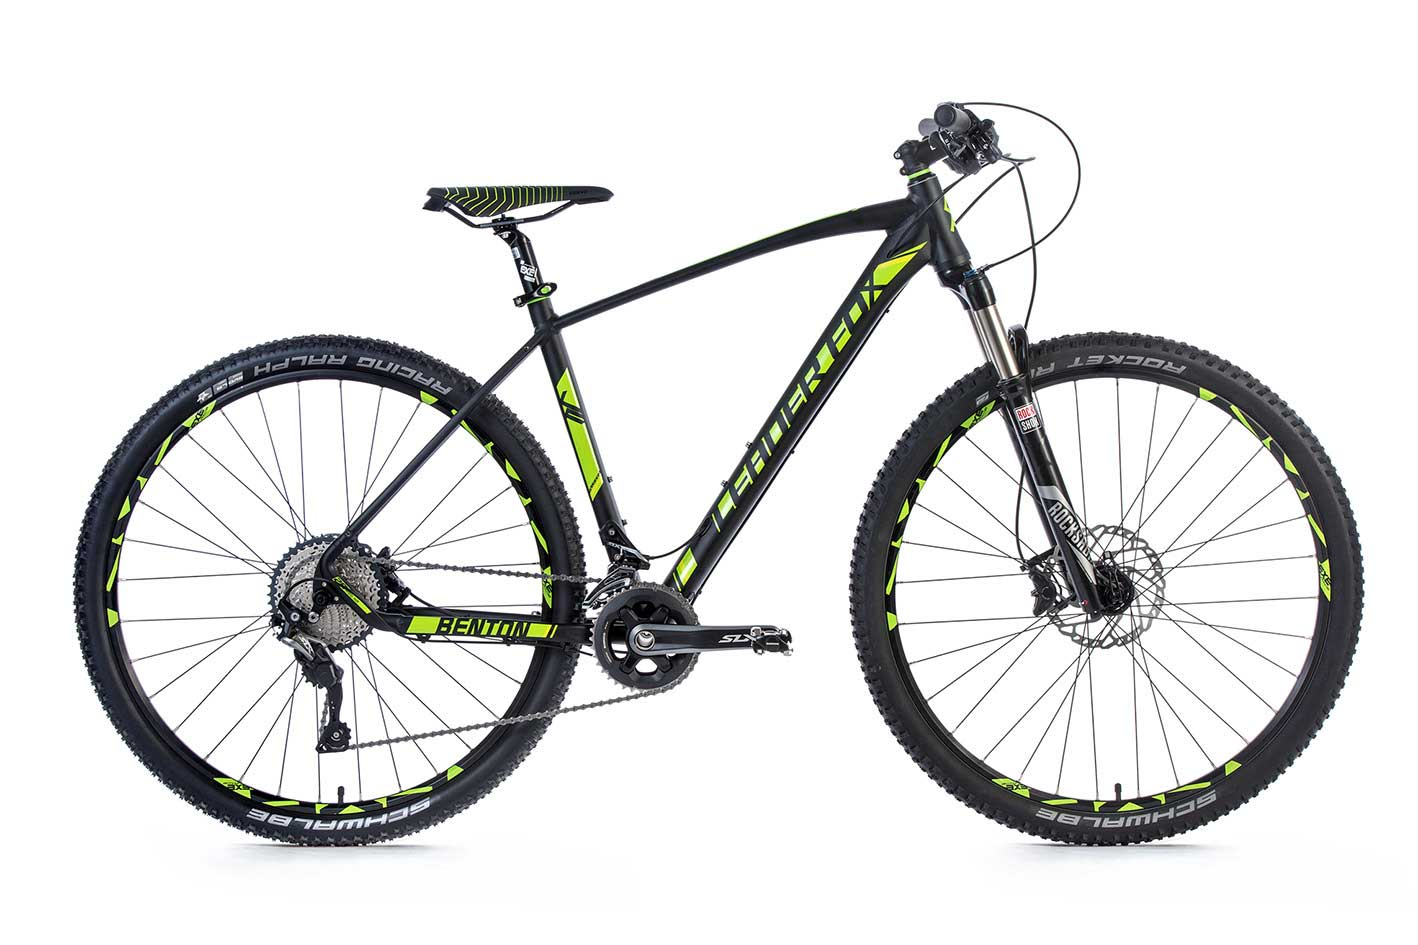 Bicicleta MTB Leader Fox BENTON 29